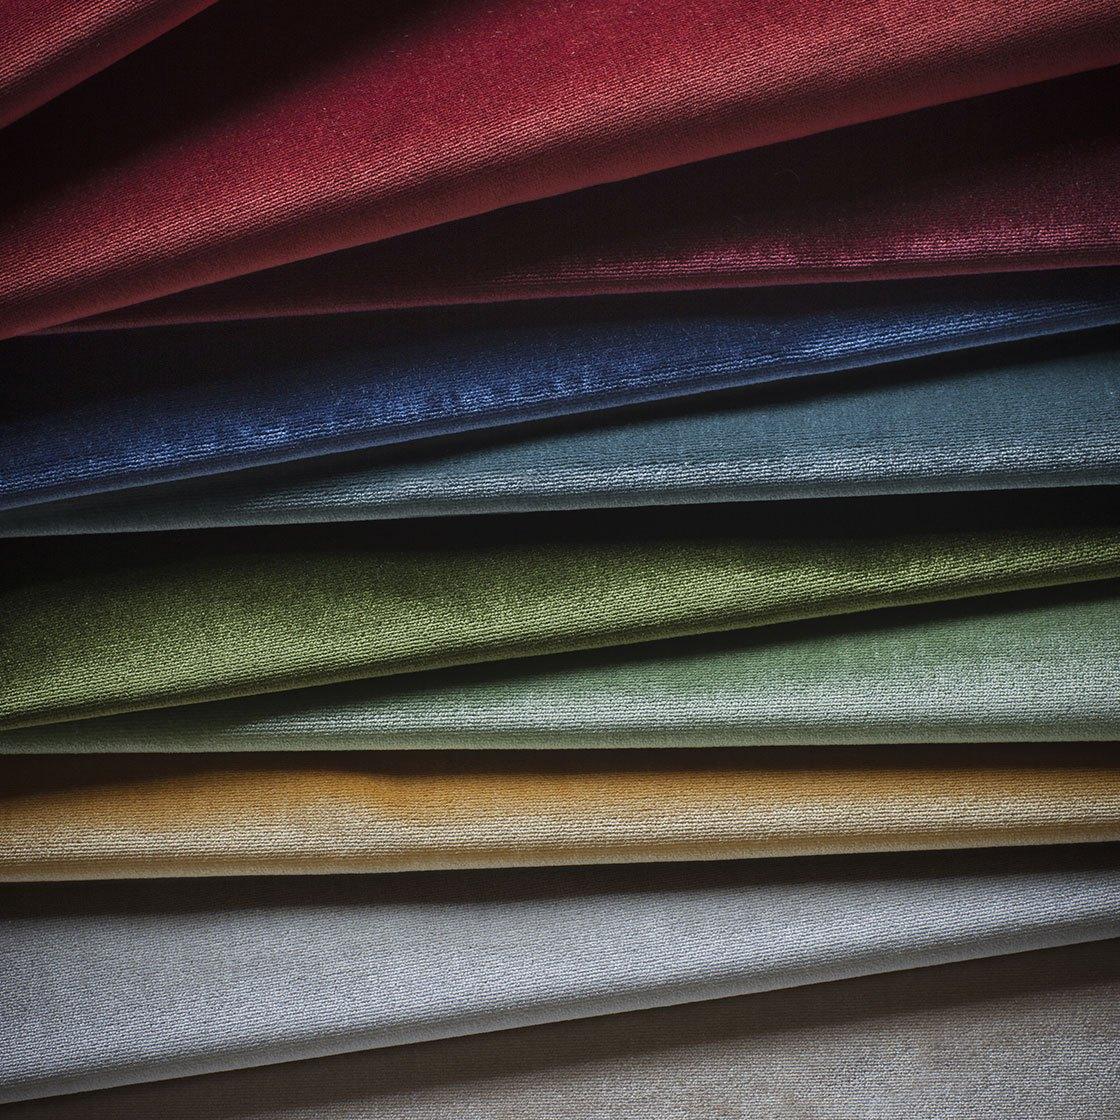 Capri Silk Velvet - Group - Beaumont & Fletcher - Beaumont & Fletcher